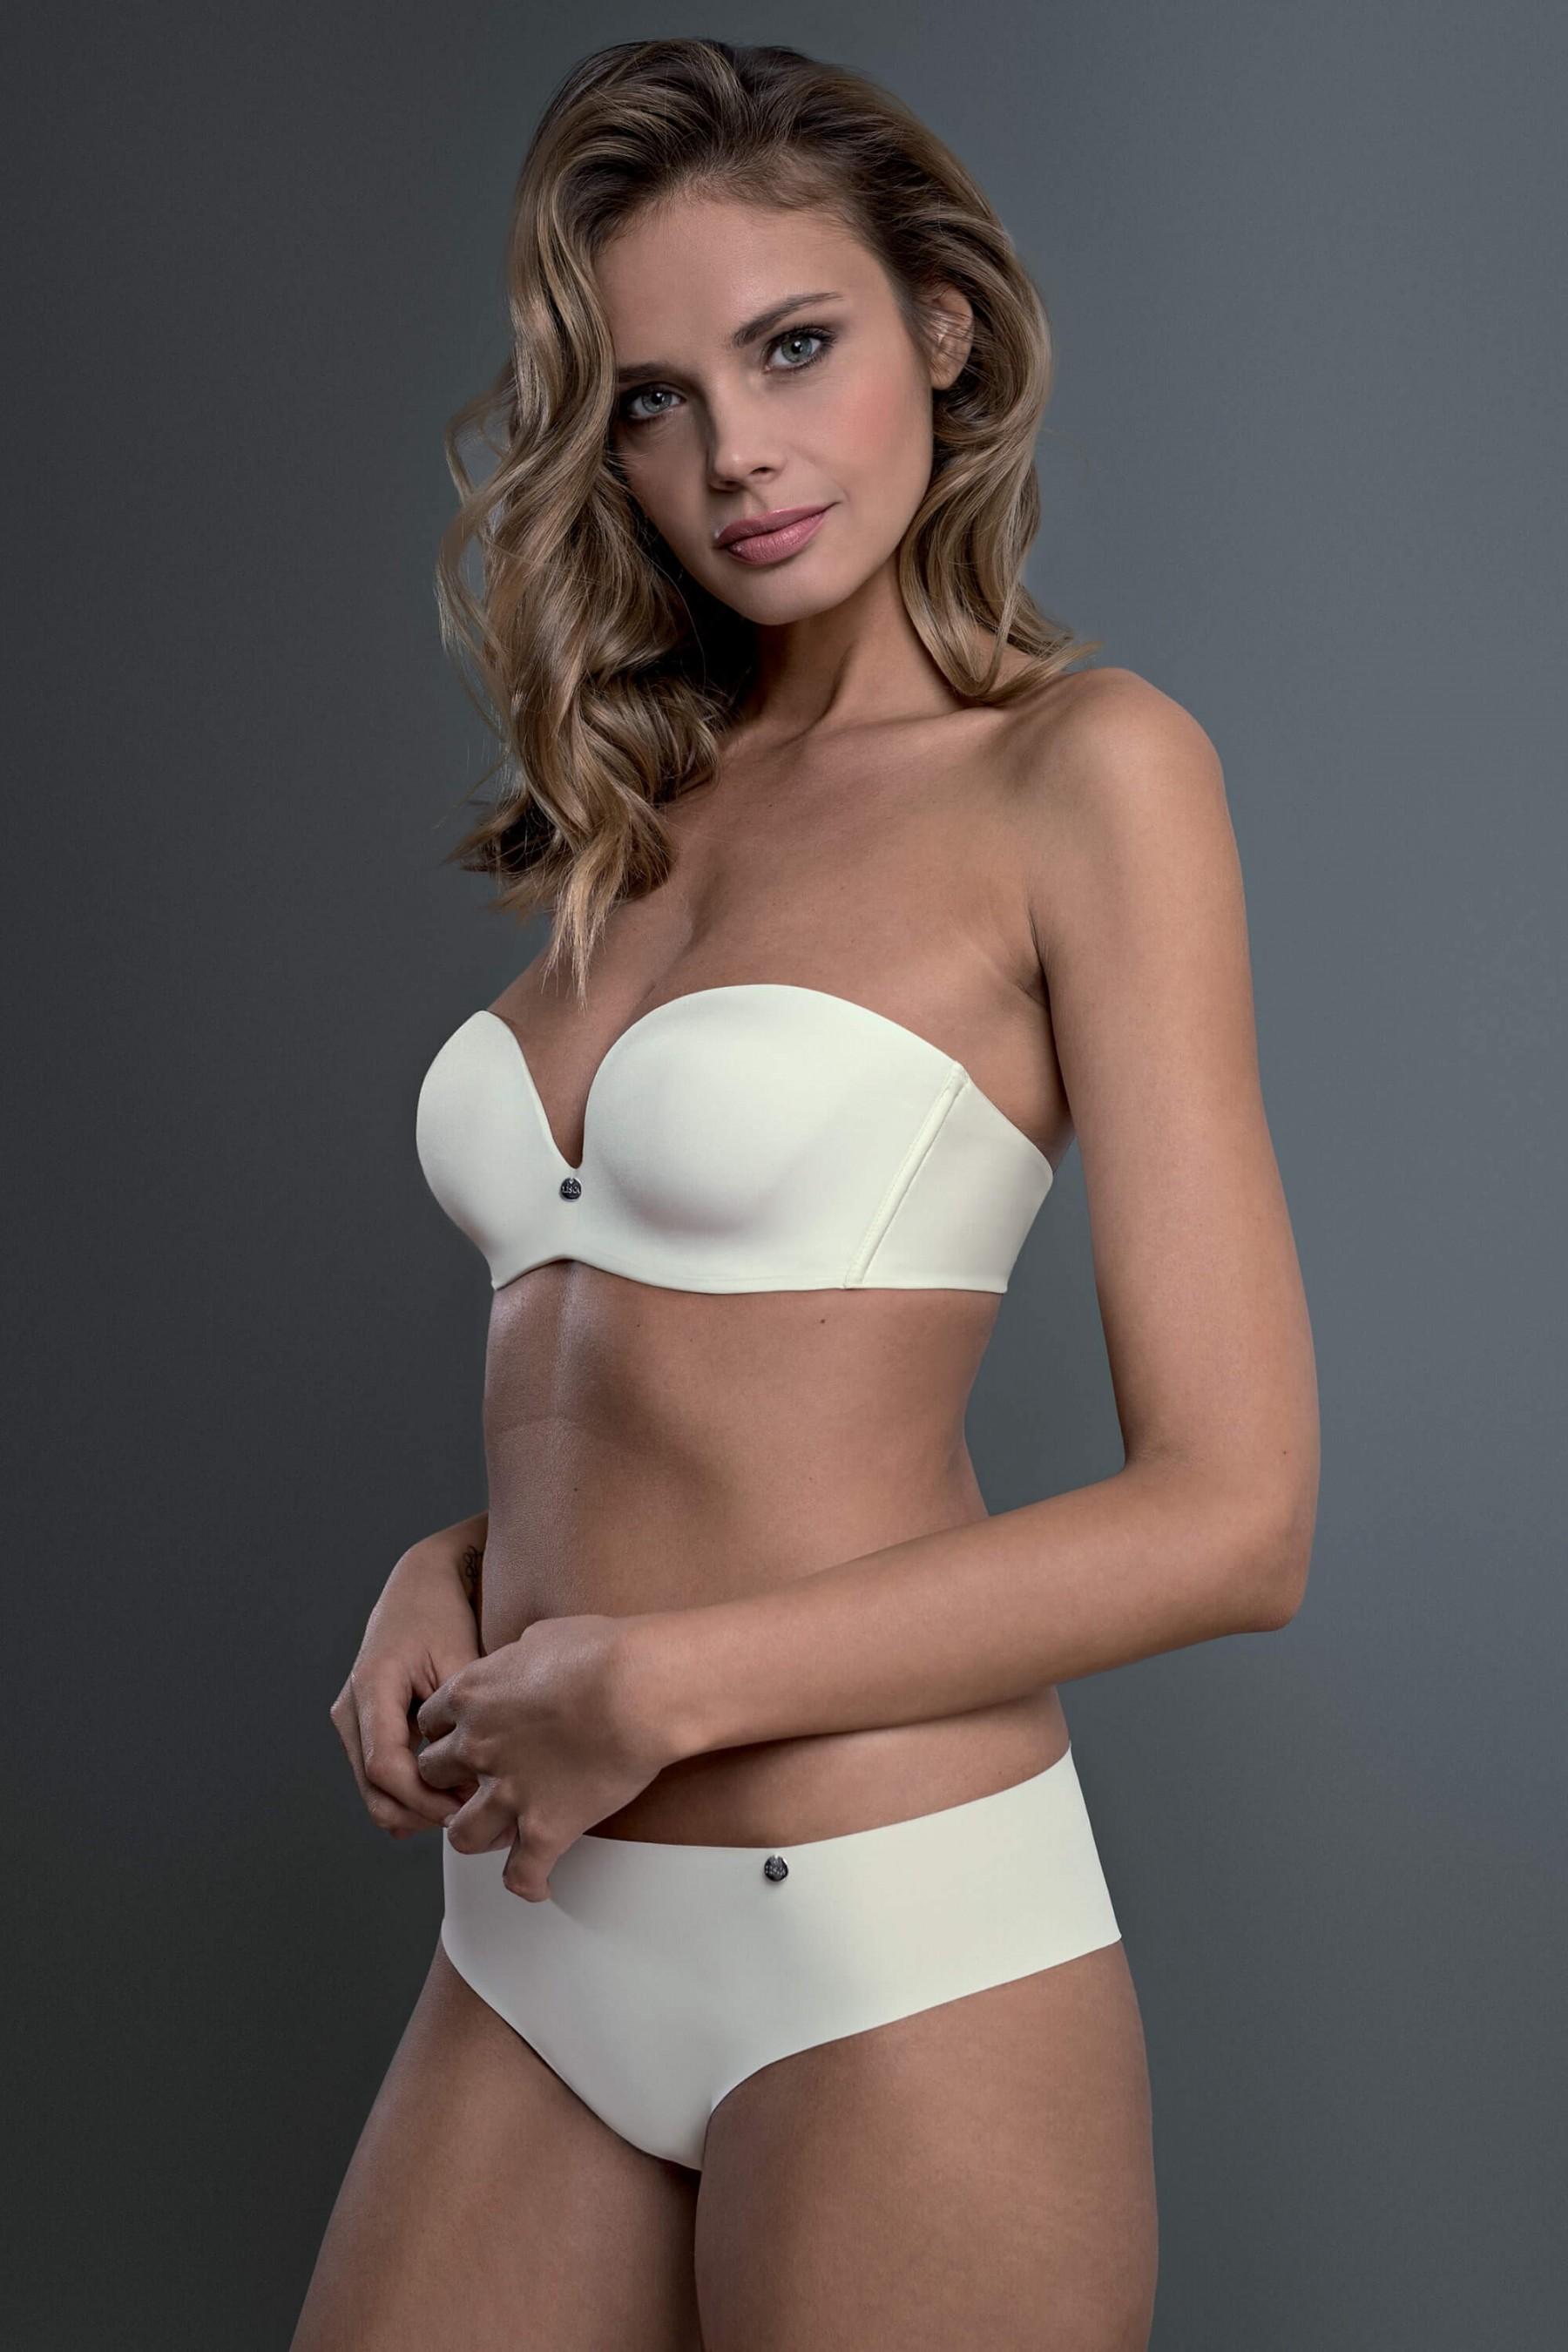 7b3713f49a »Bella« Underwired Strapless Bra - WOMEN - LINGERIE - Lisca e-shop